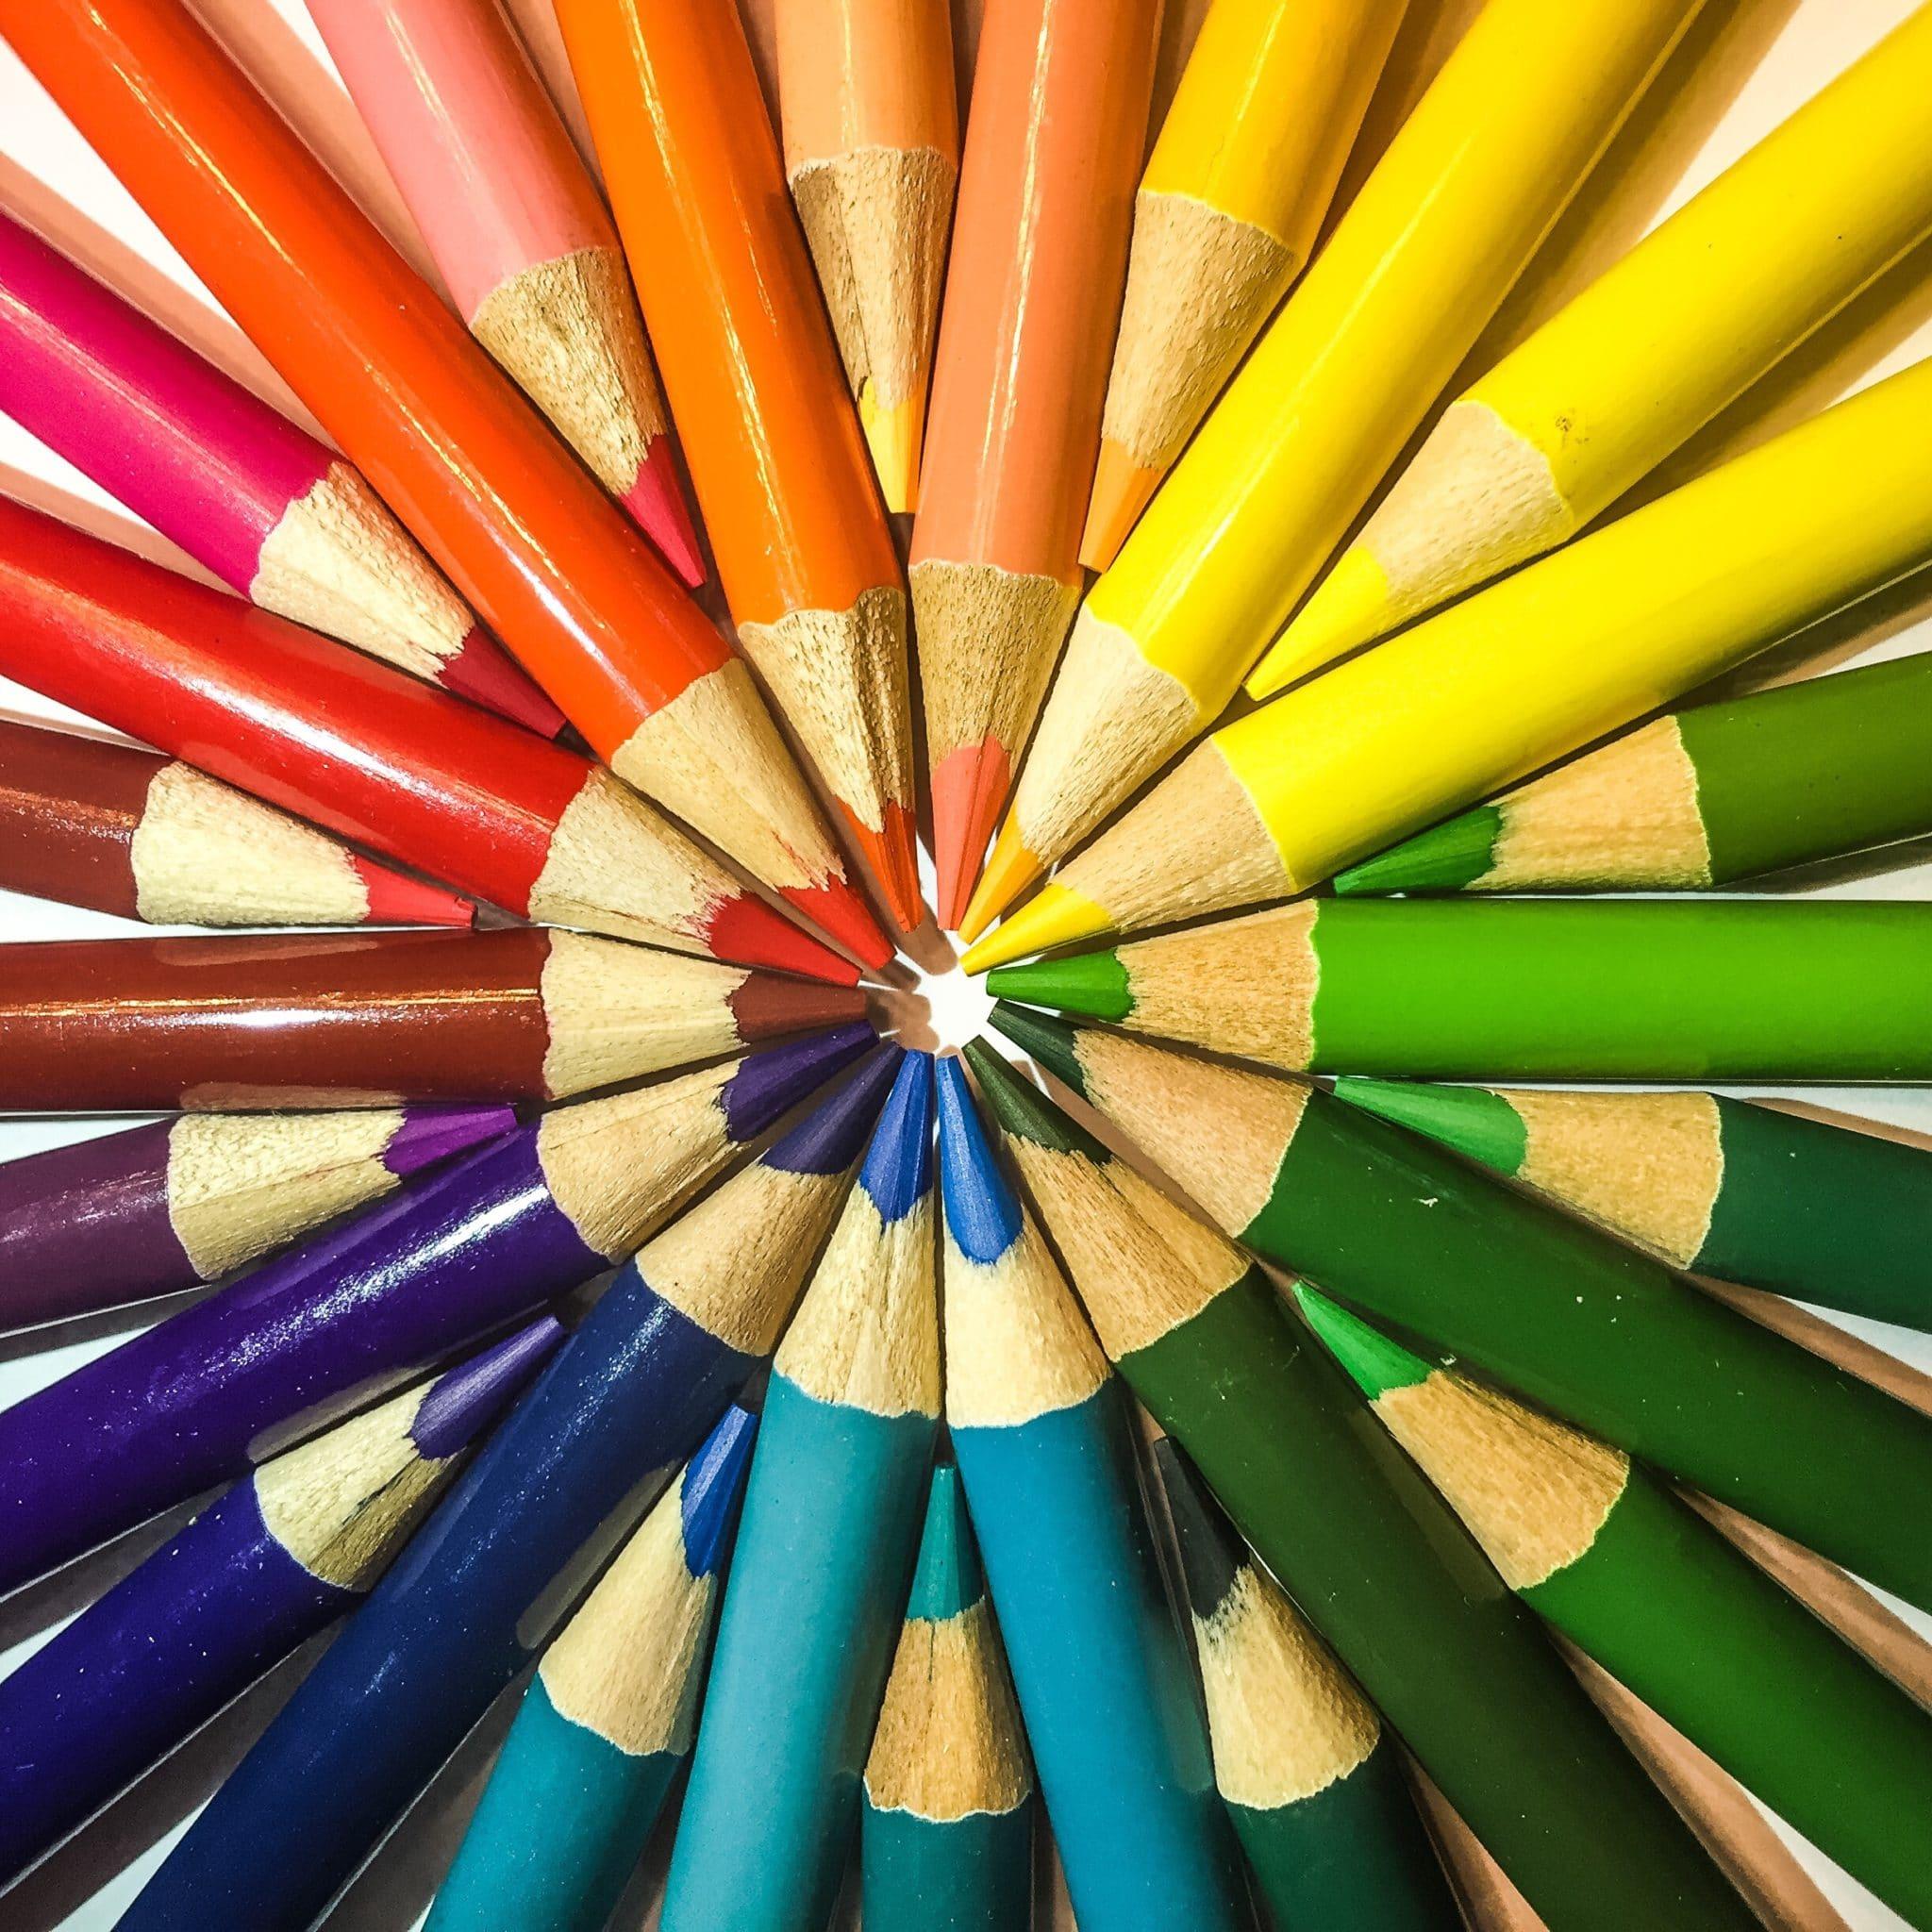 colored-pencils-target_t20_6wxldp-2048x2048